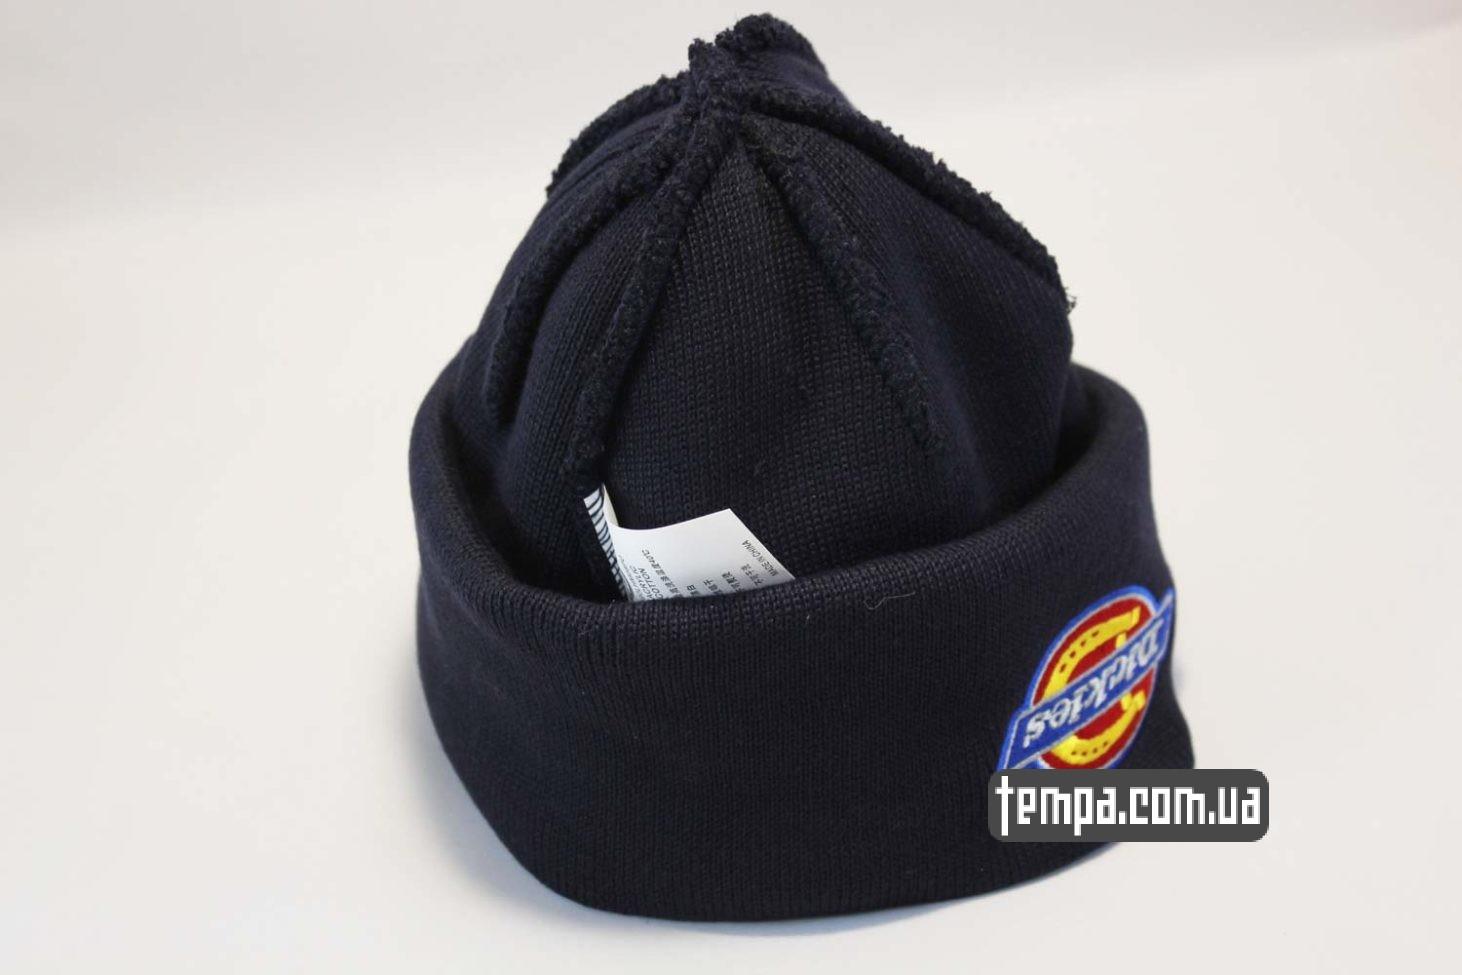 dickies украина шапка beanie Dickies синяя купить Украина